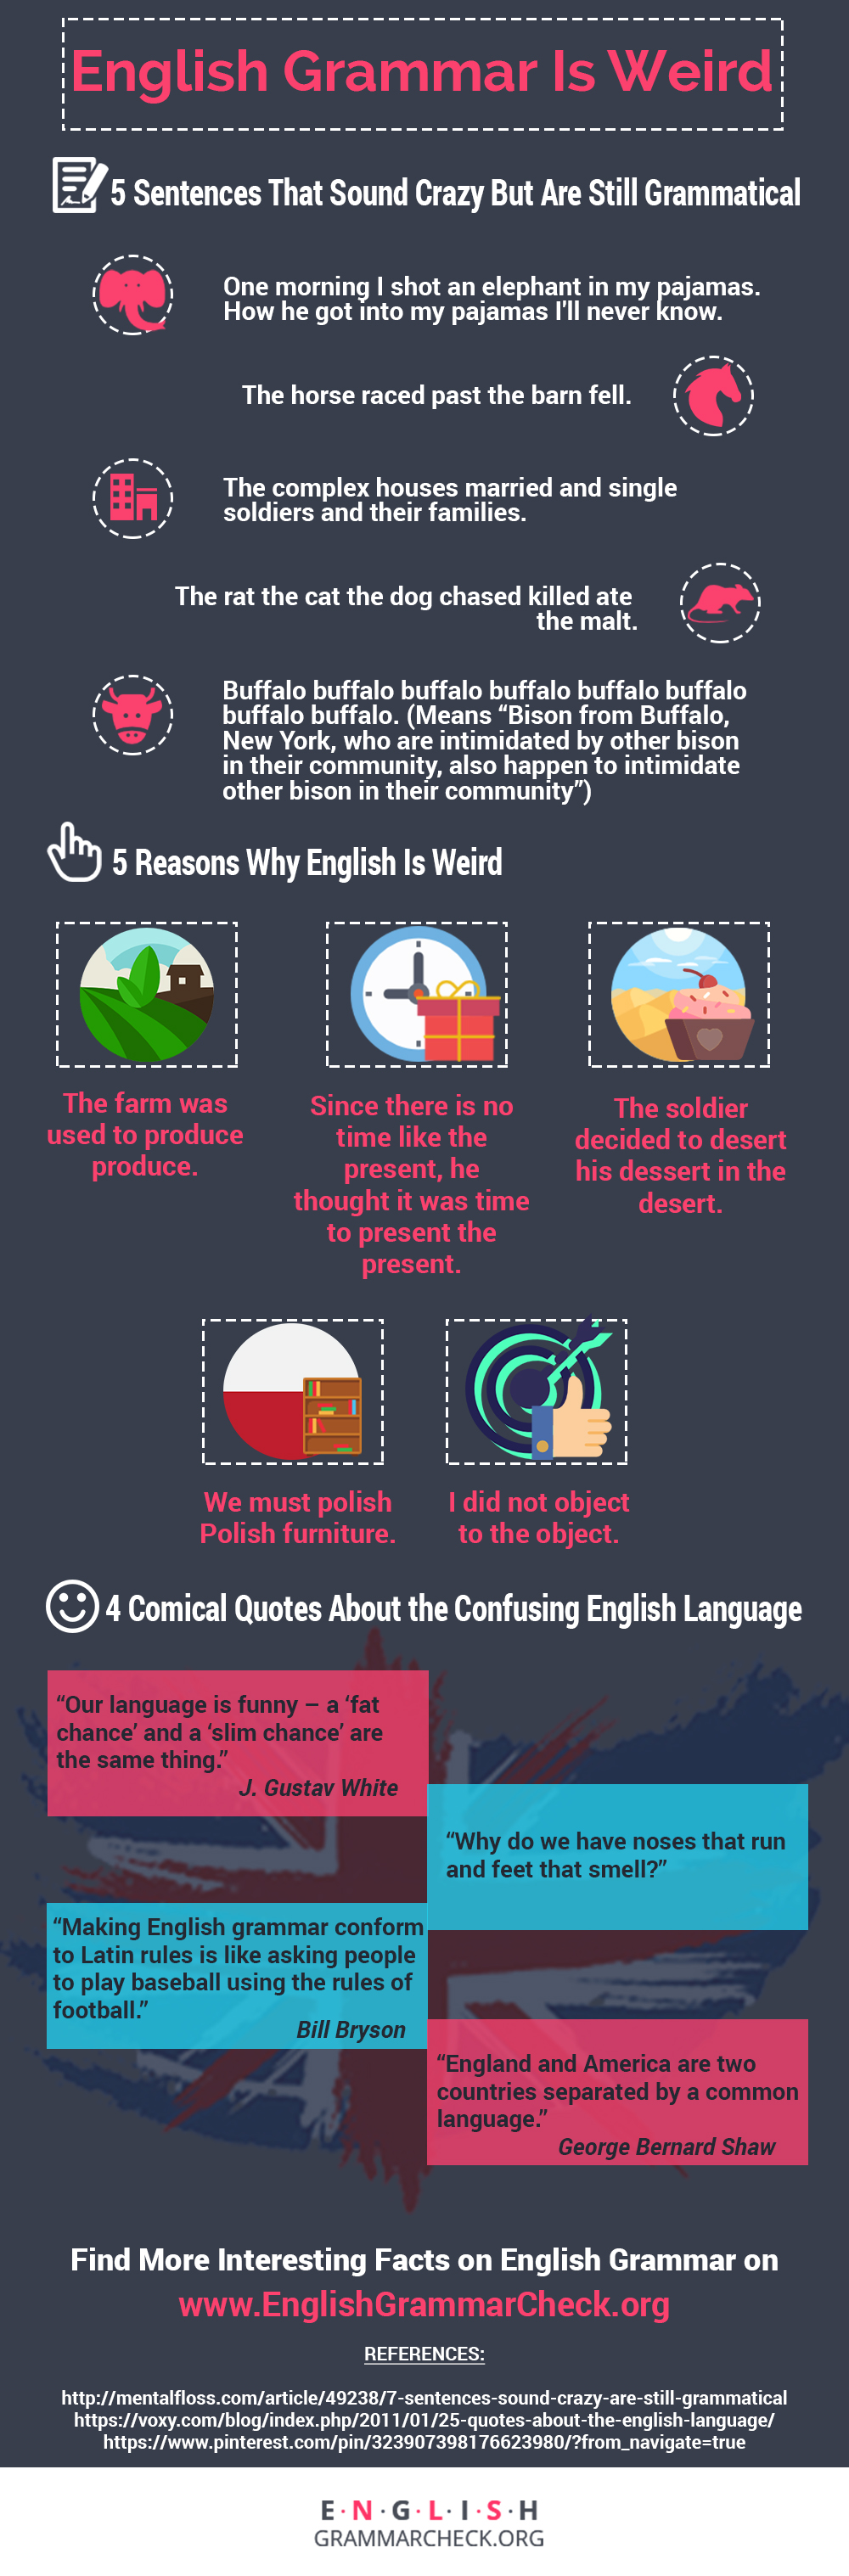 english-grammar-is-weird